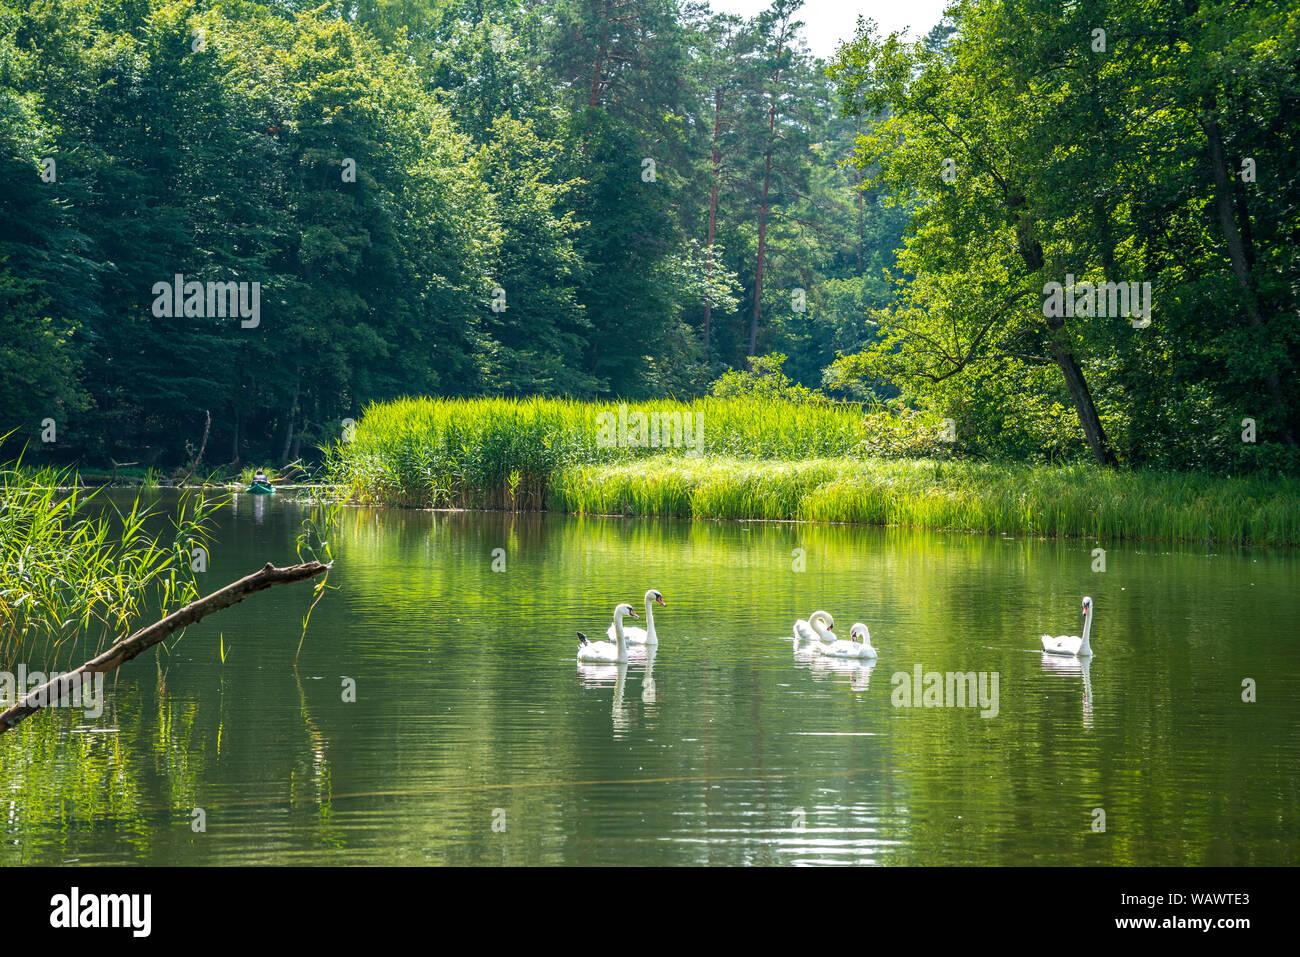 Schwäne auf dem  Fluss Krutynia oder Kruttinna, UNESCO Biosphärenreservat Masurische Seen bei Krutyn, Ermland-Masuren, Polen, Europa | swans on the Kr Stock Photo